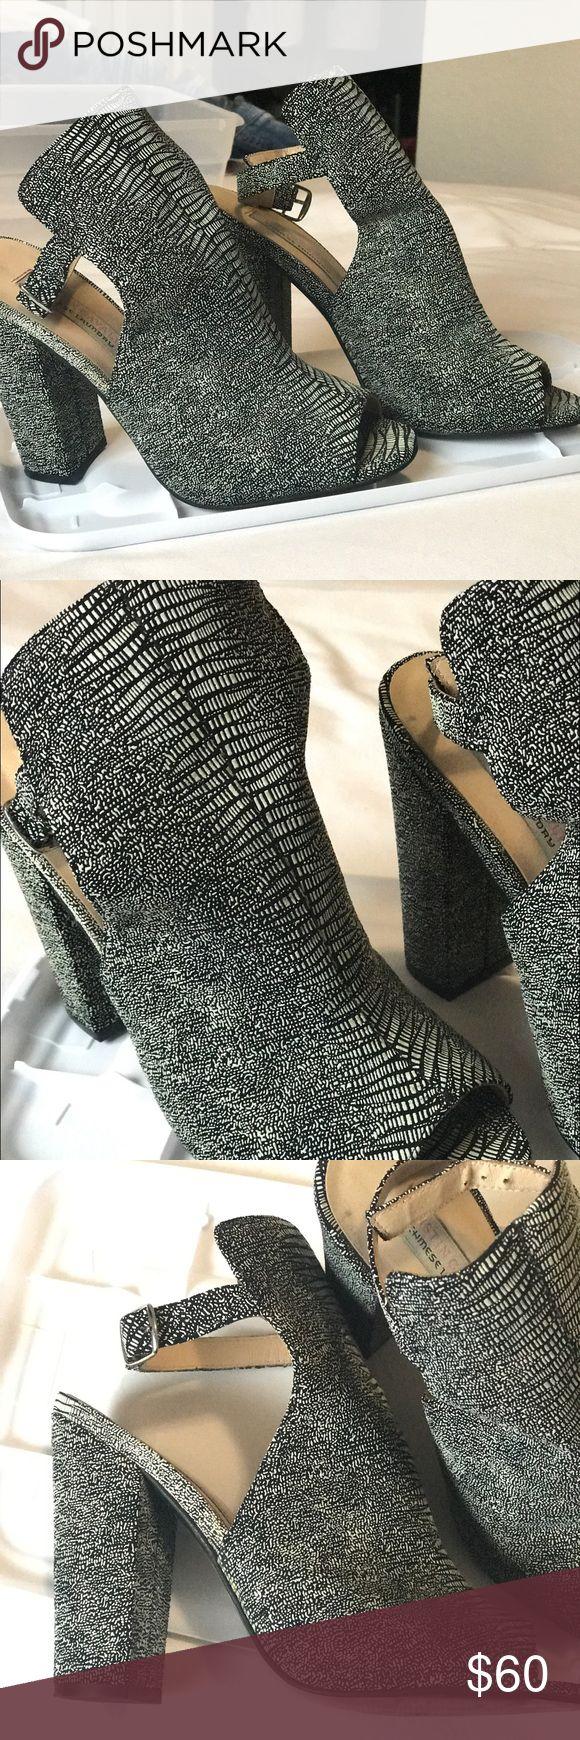 Kristin Cavalari by Chinese laundry boots Kristin Cavalari by Chinese laundry boots, perfect condition Chinese Laundry Shoes Ankle Boots & Booties